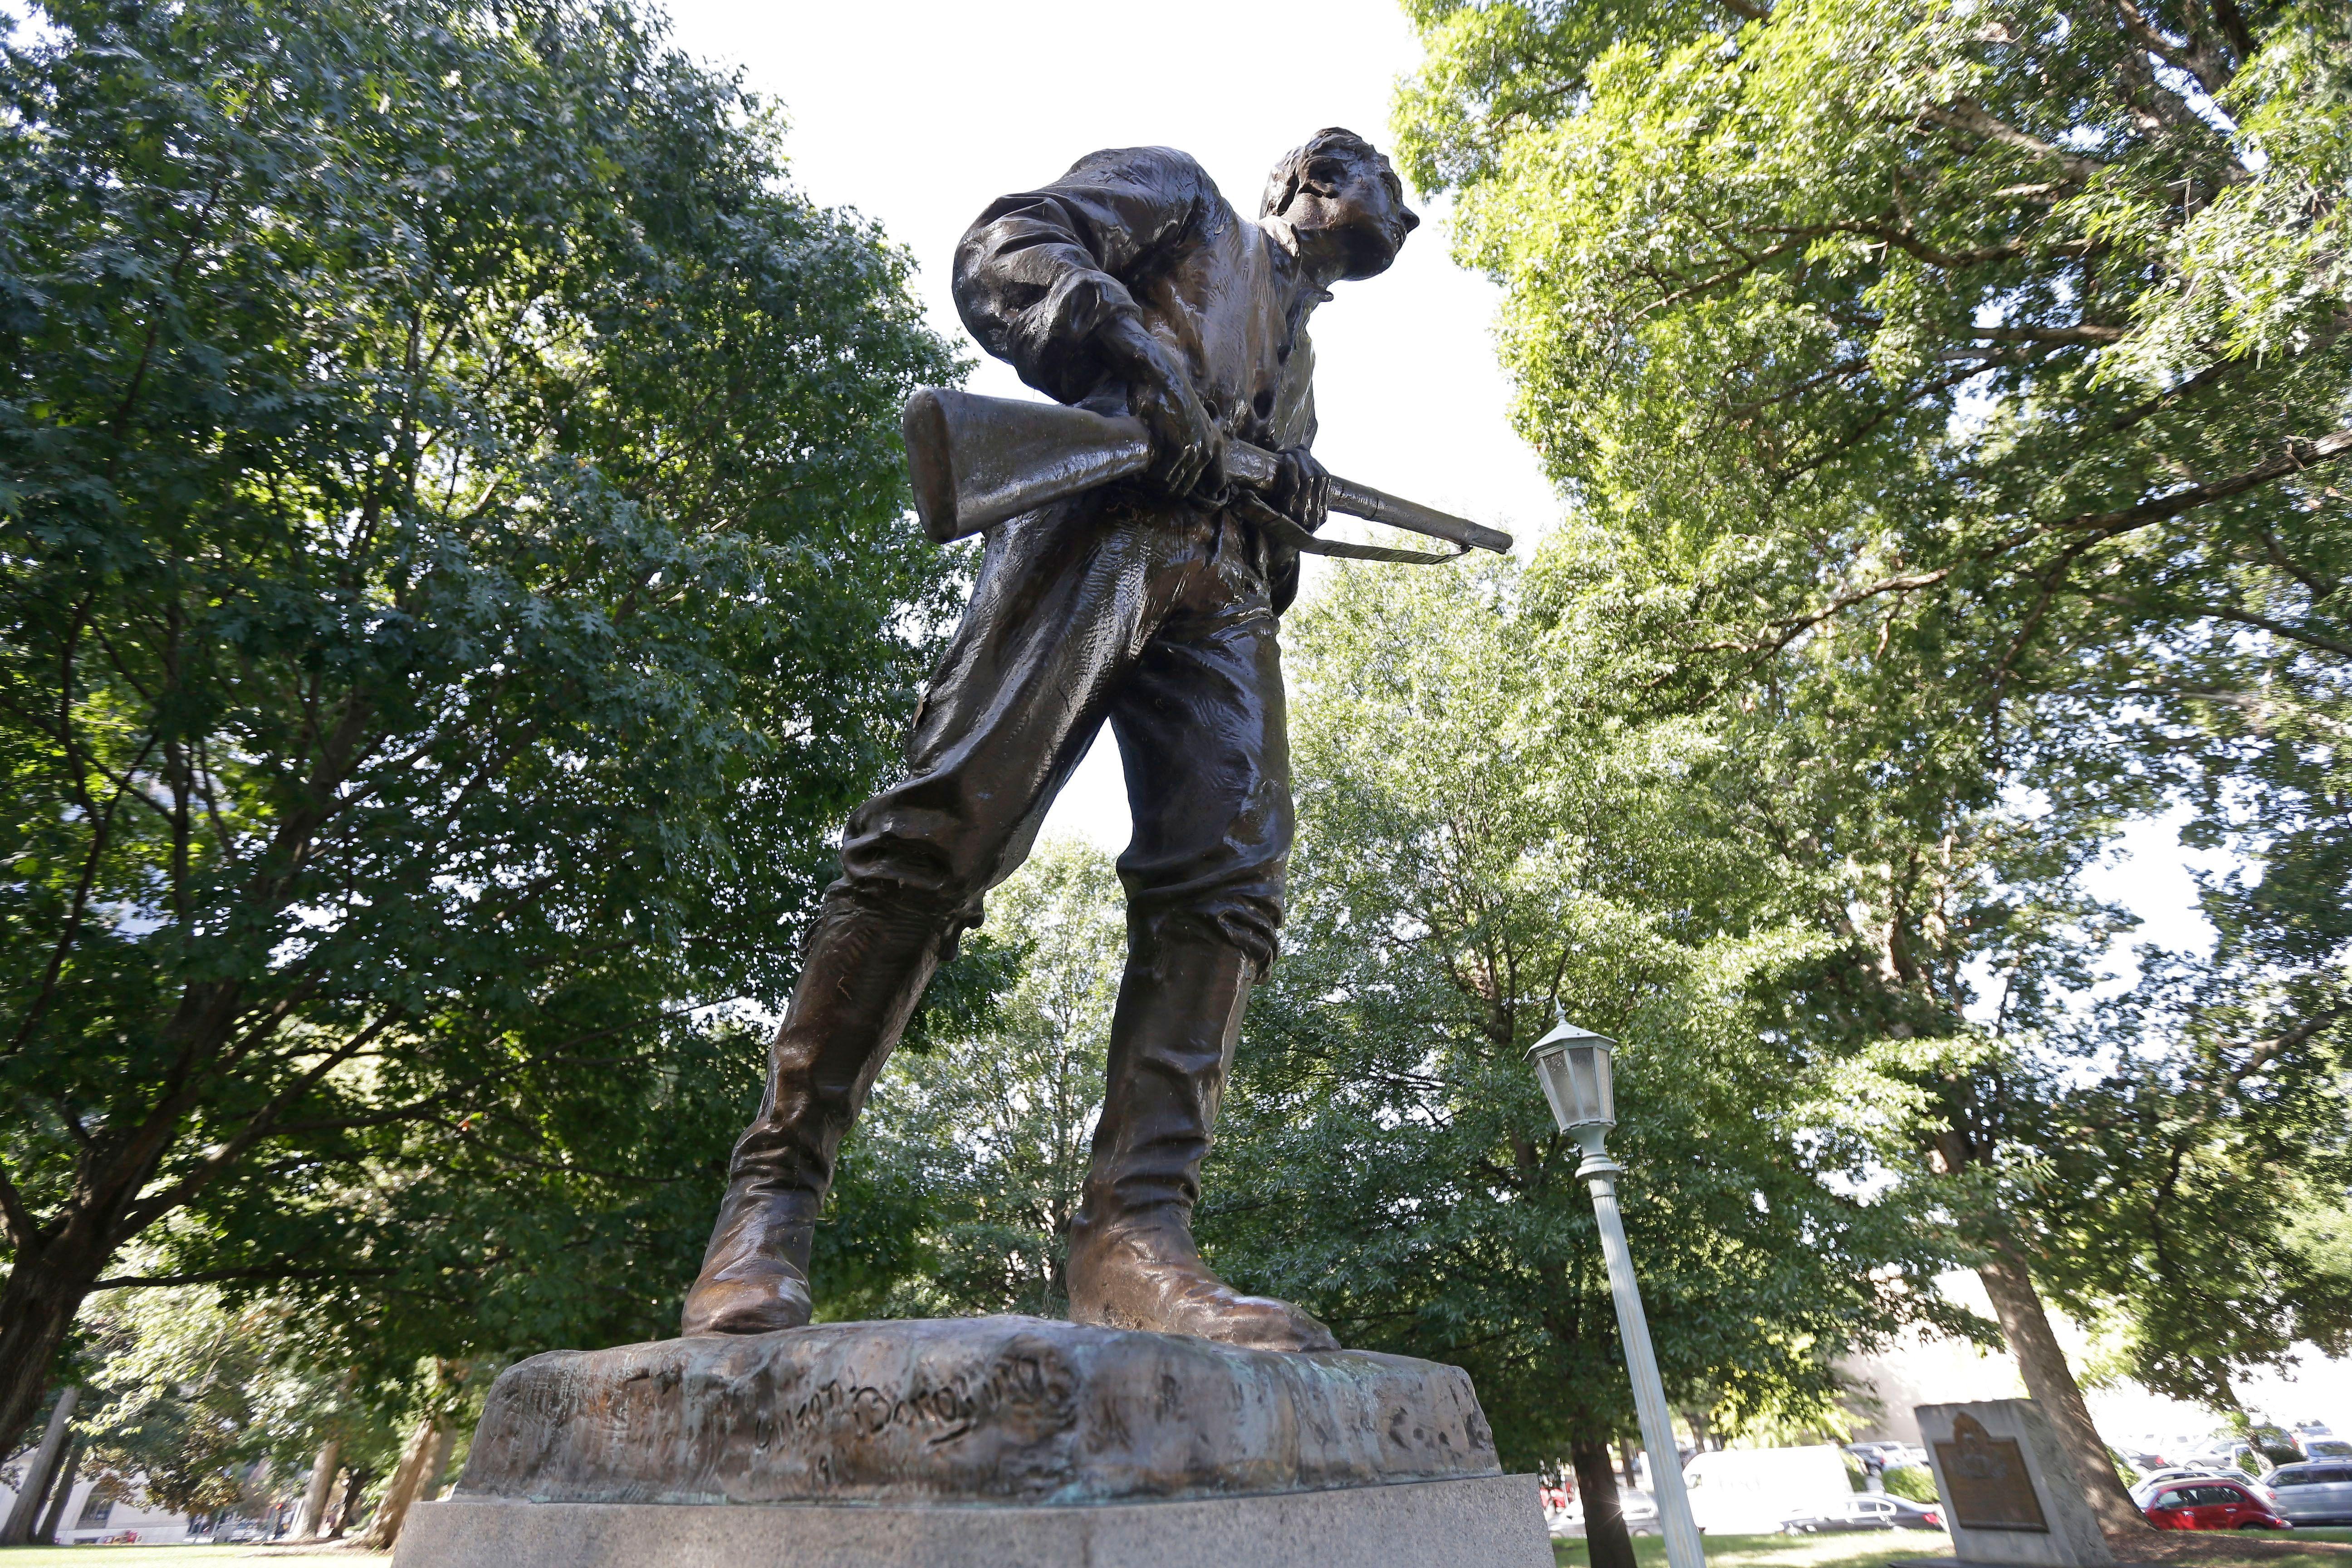 Confederate Monuments North Carolina, Raleigh, USA - 19 Sep 2017